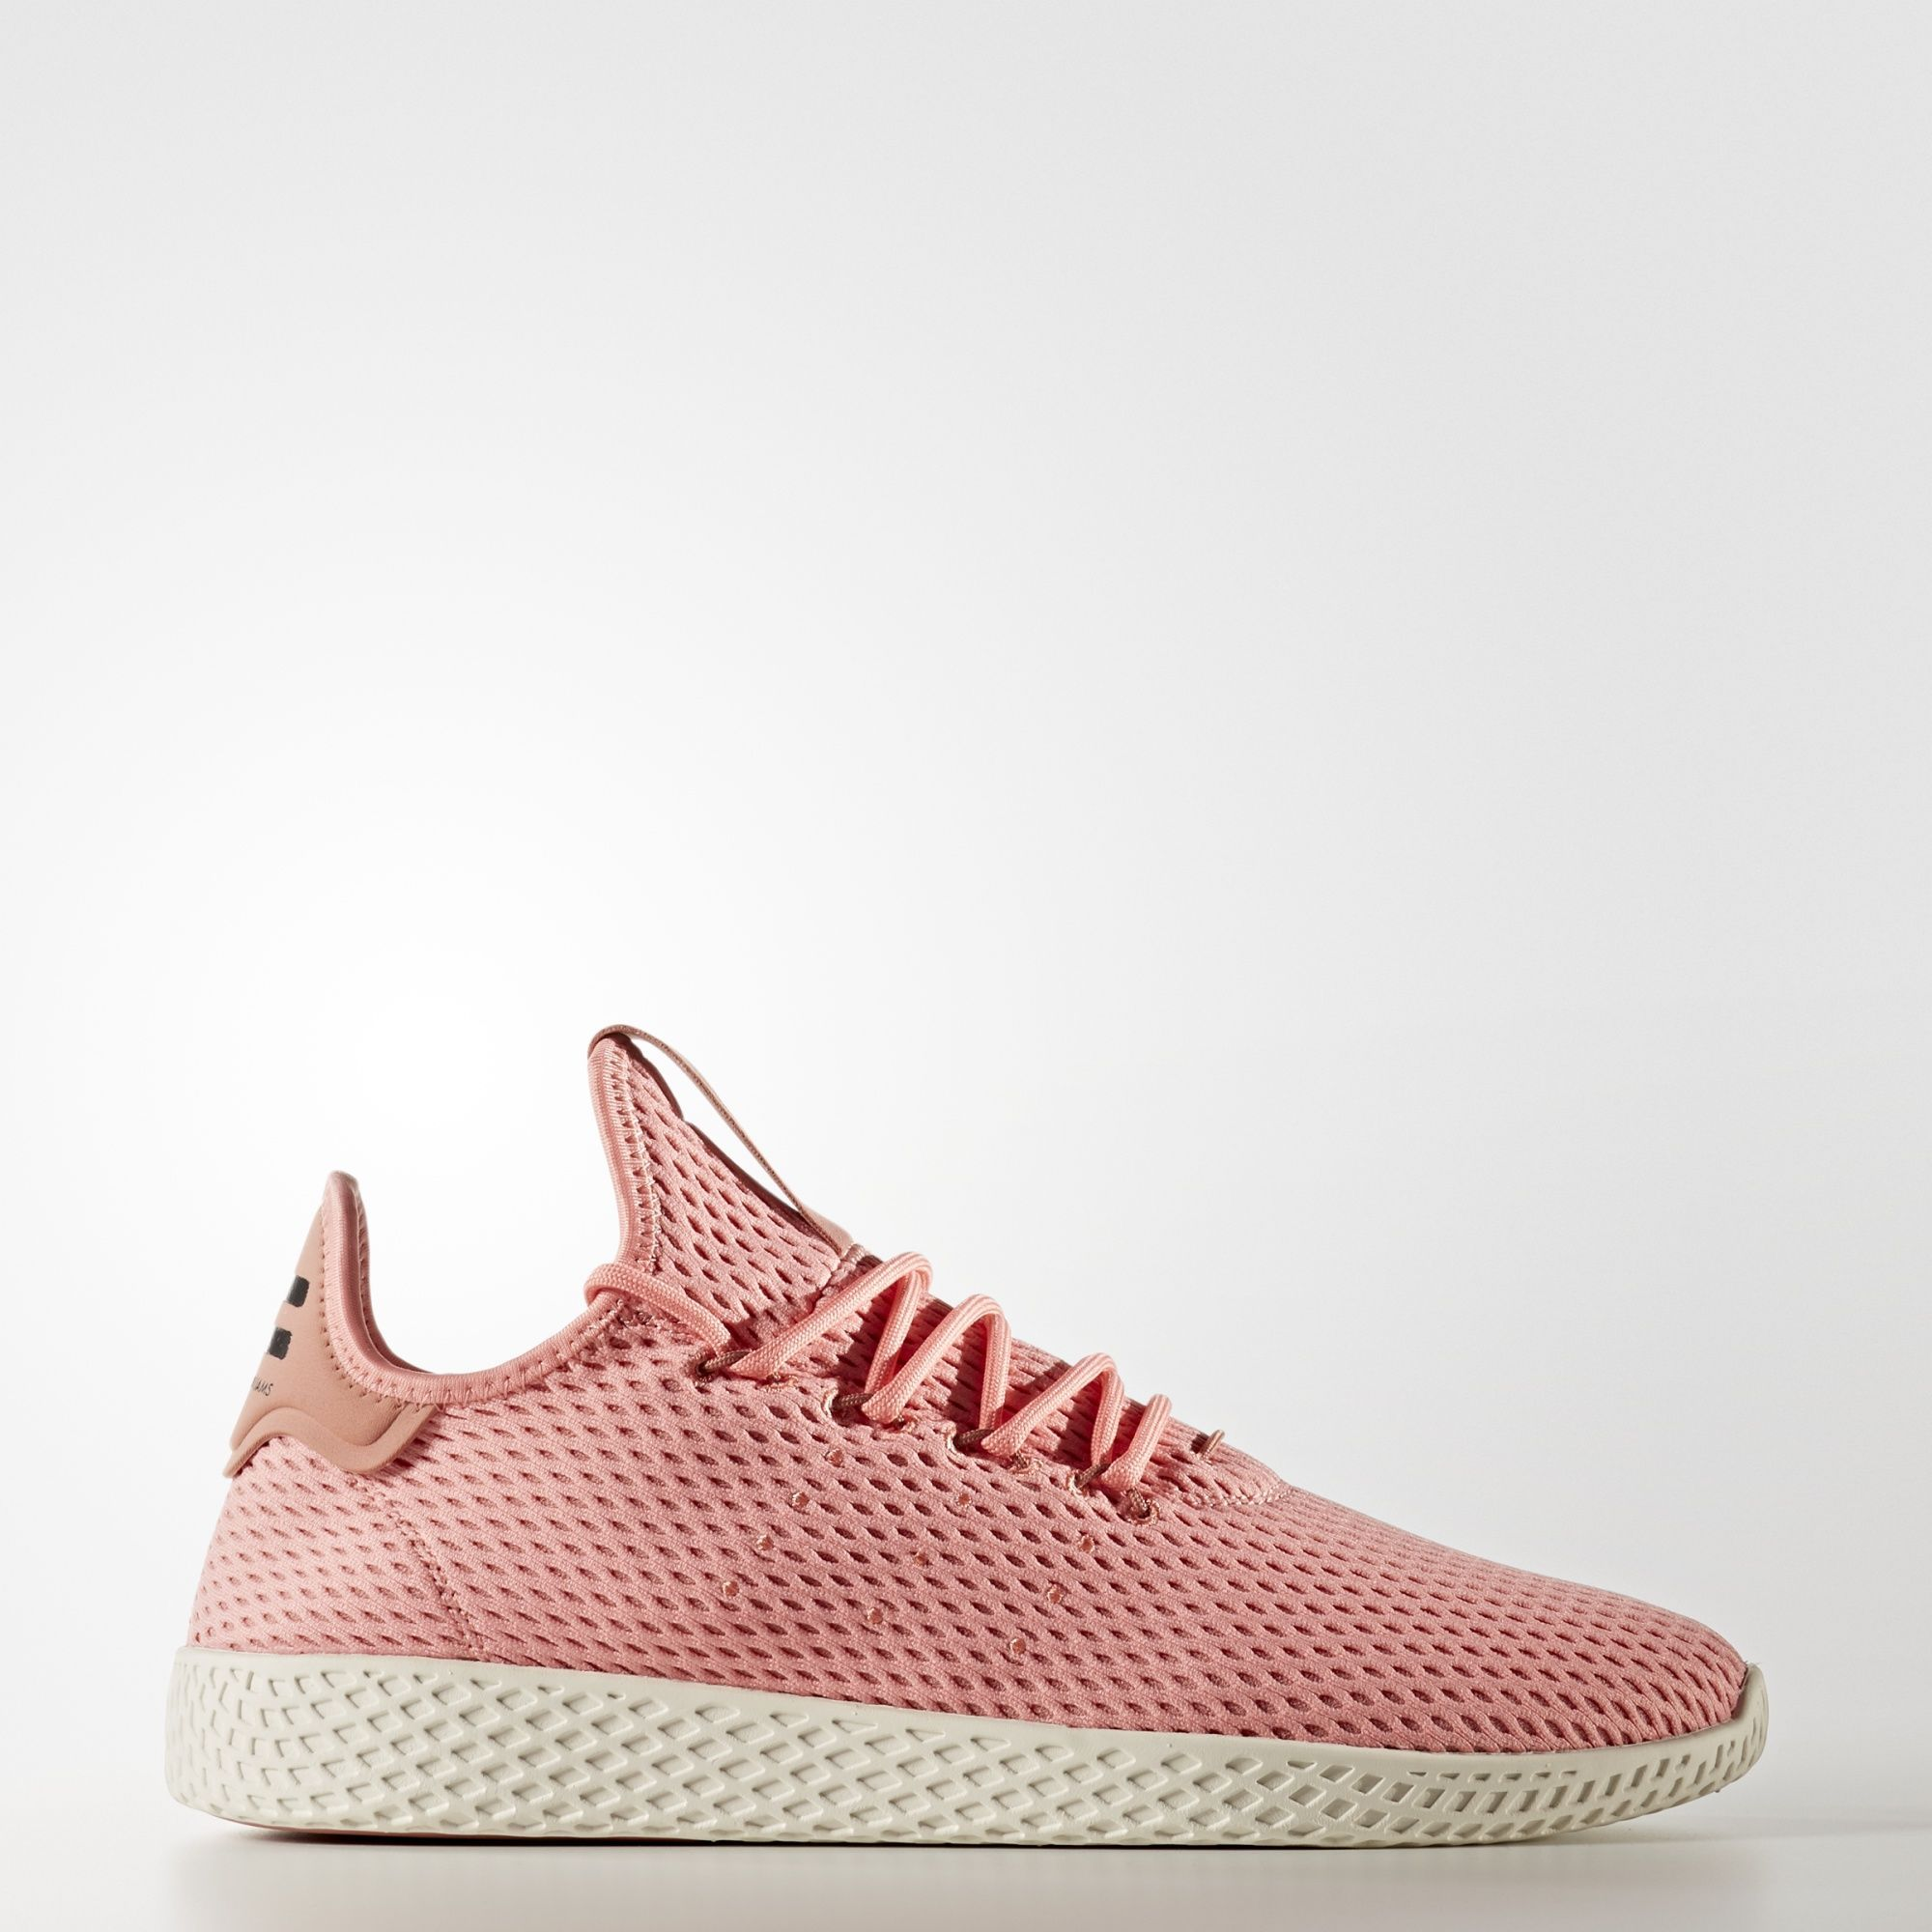 adidas Pharrell Williams Tennis HU Schuh | Shoes de 2019